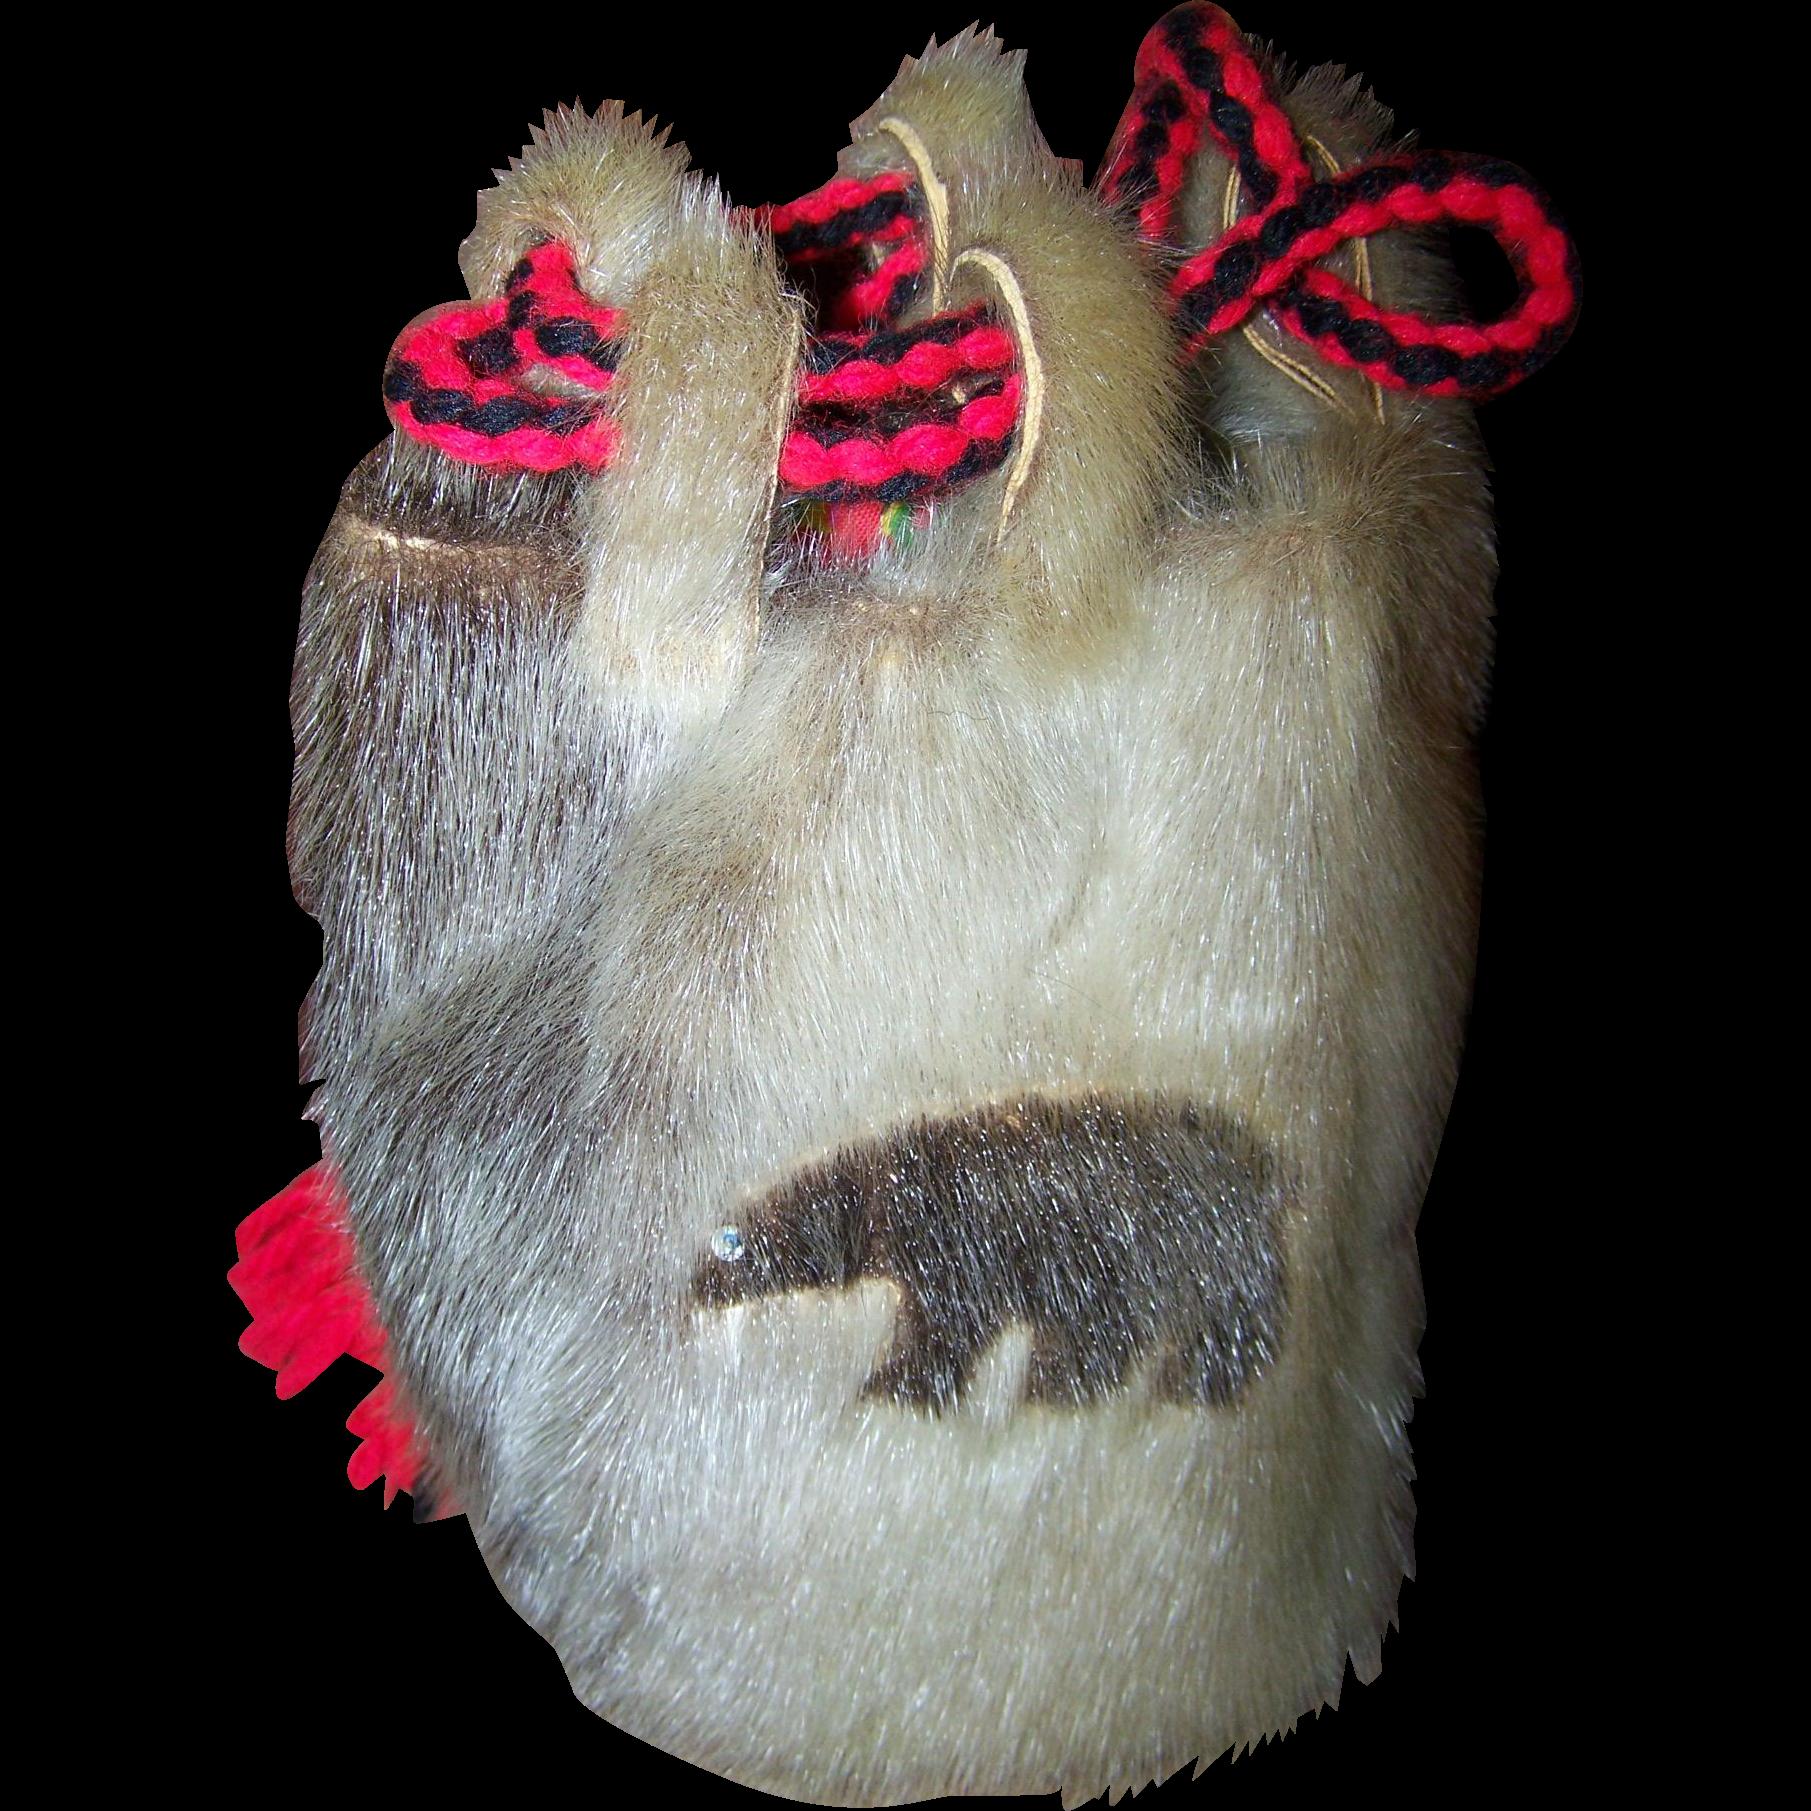 A Vintage Tourist Trade Native Aboriginal Inuit Fur Drawstring Bag Purse Pouch